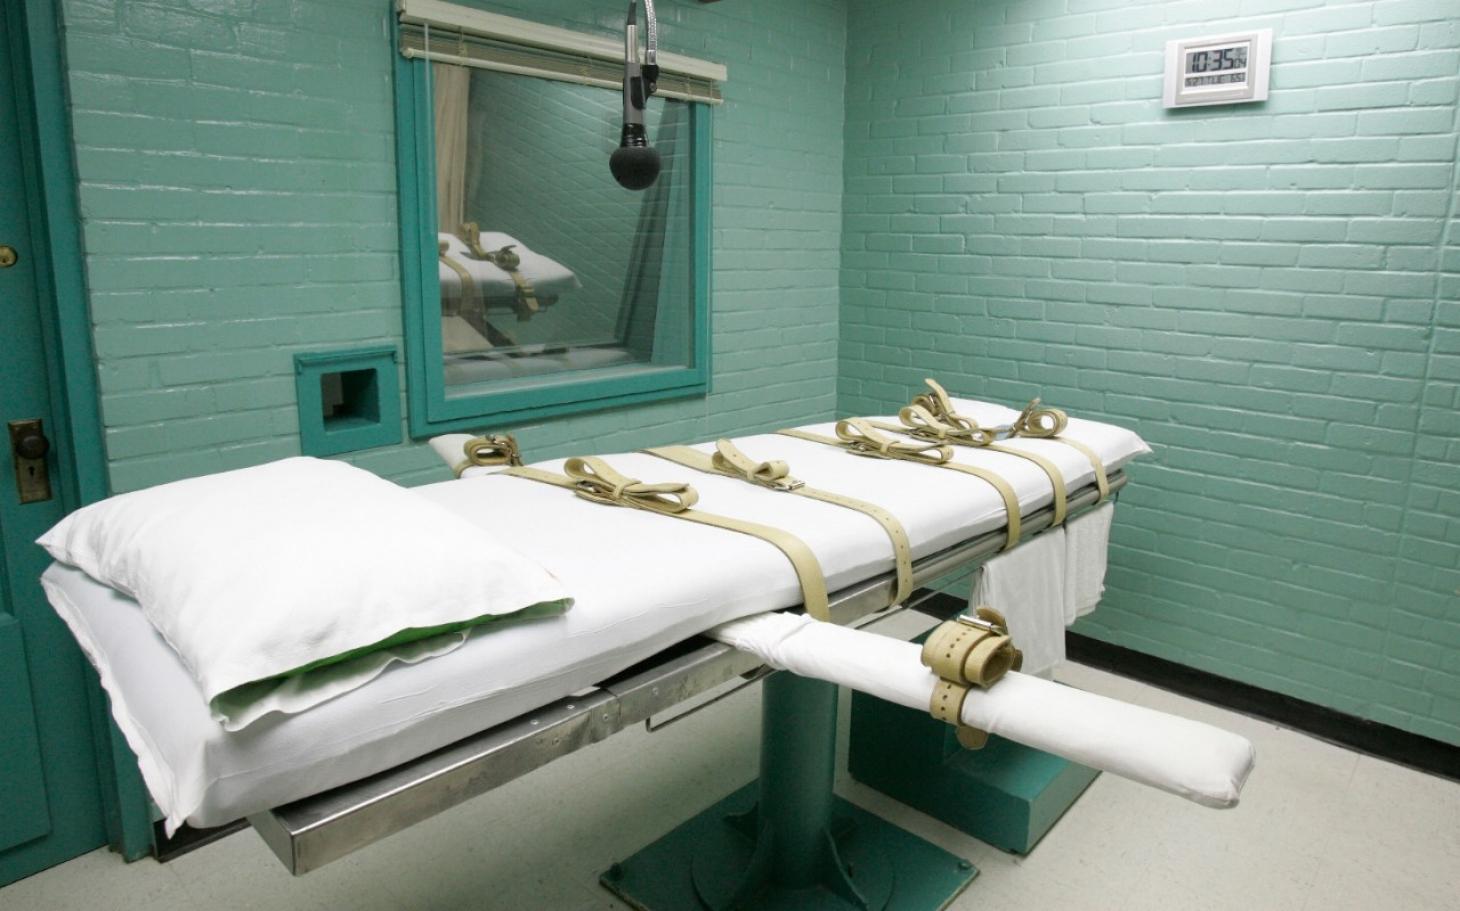 Vermont Hospital Mishhandled Mental Patients | Al Jazeera America